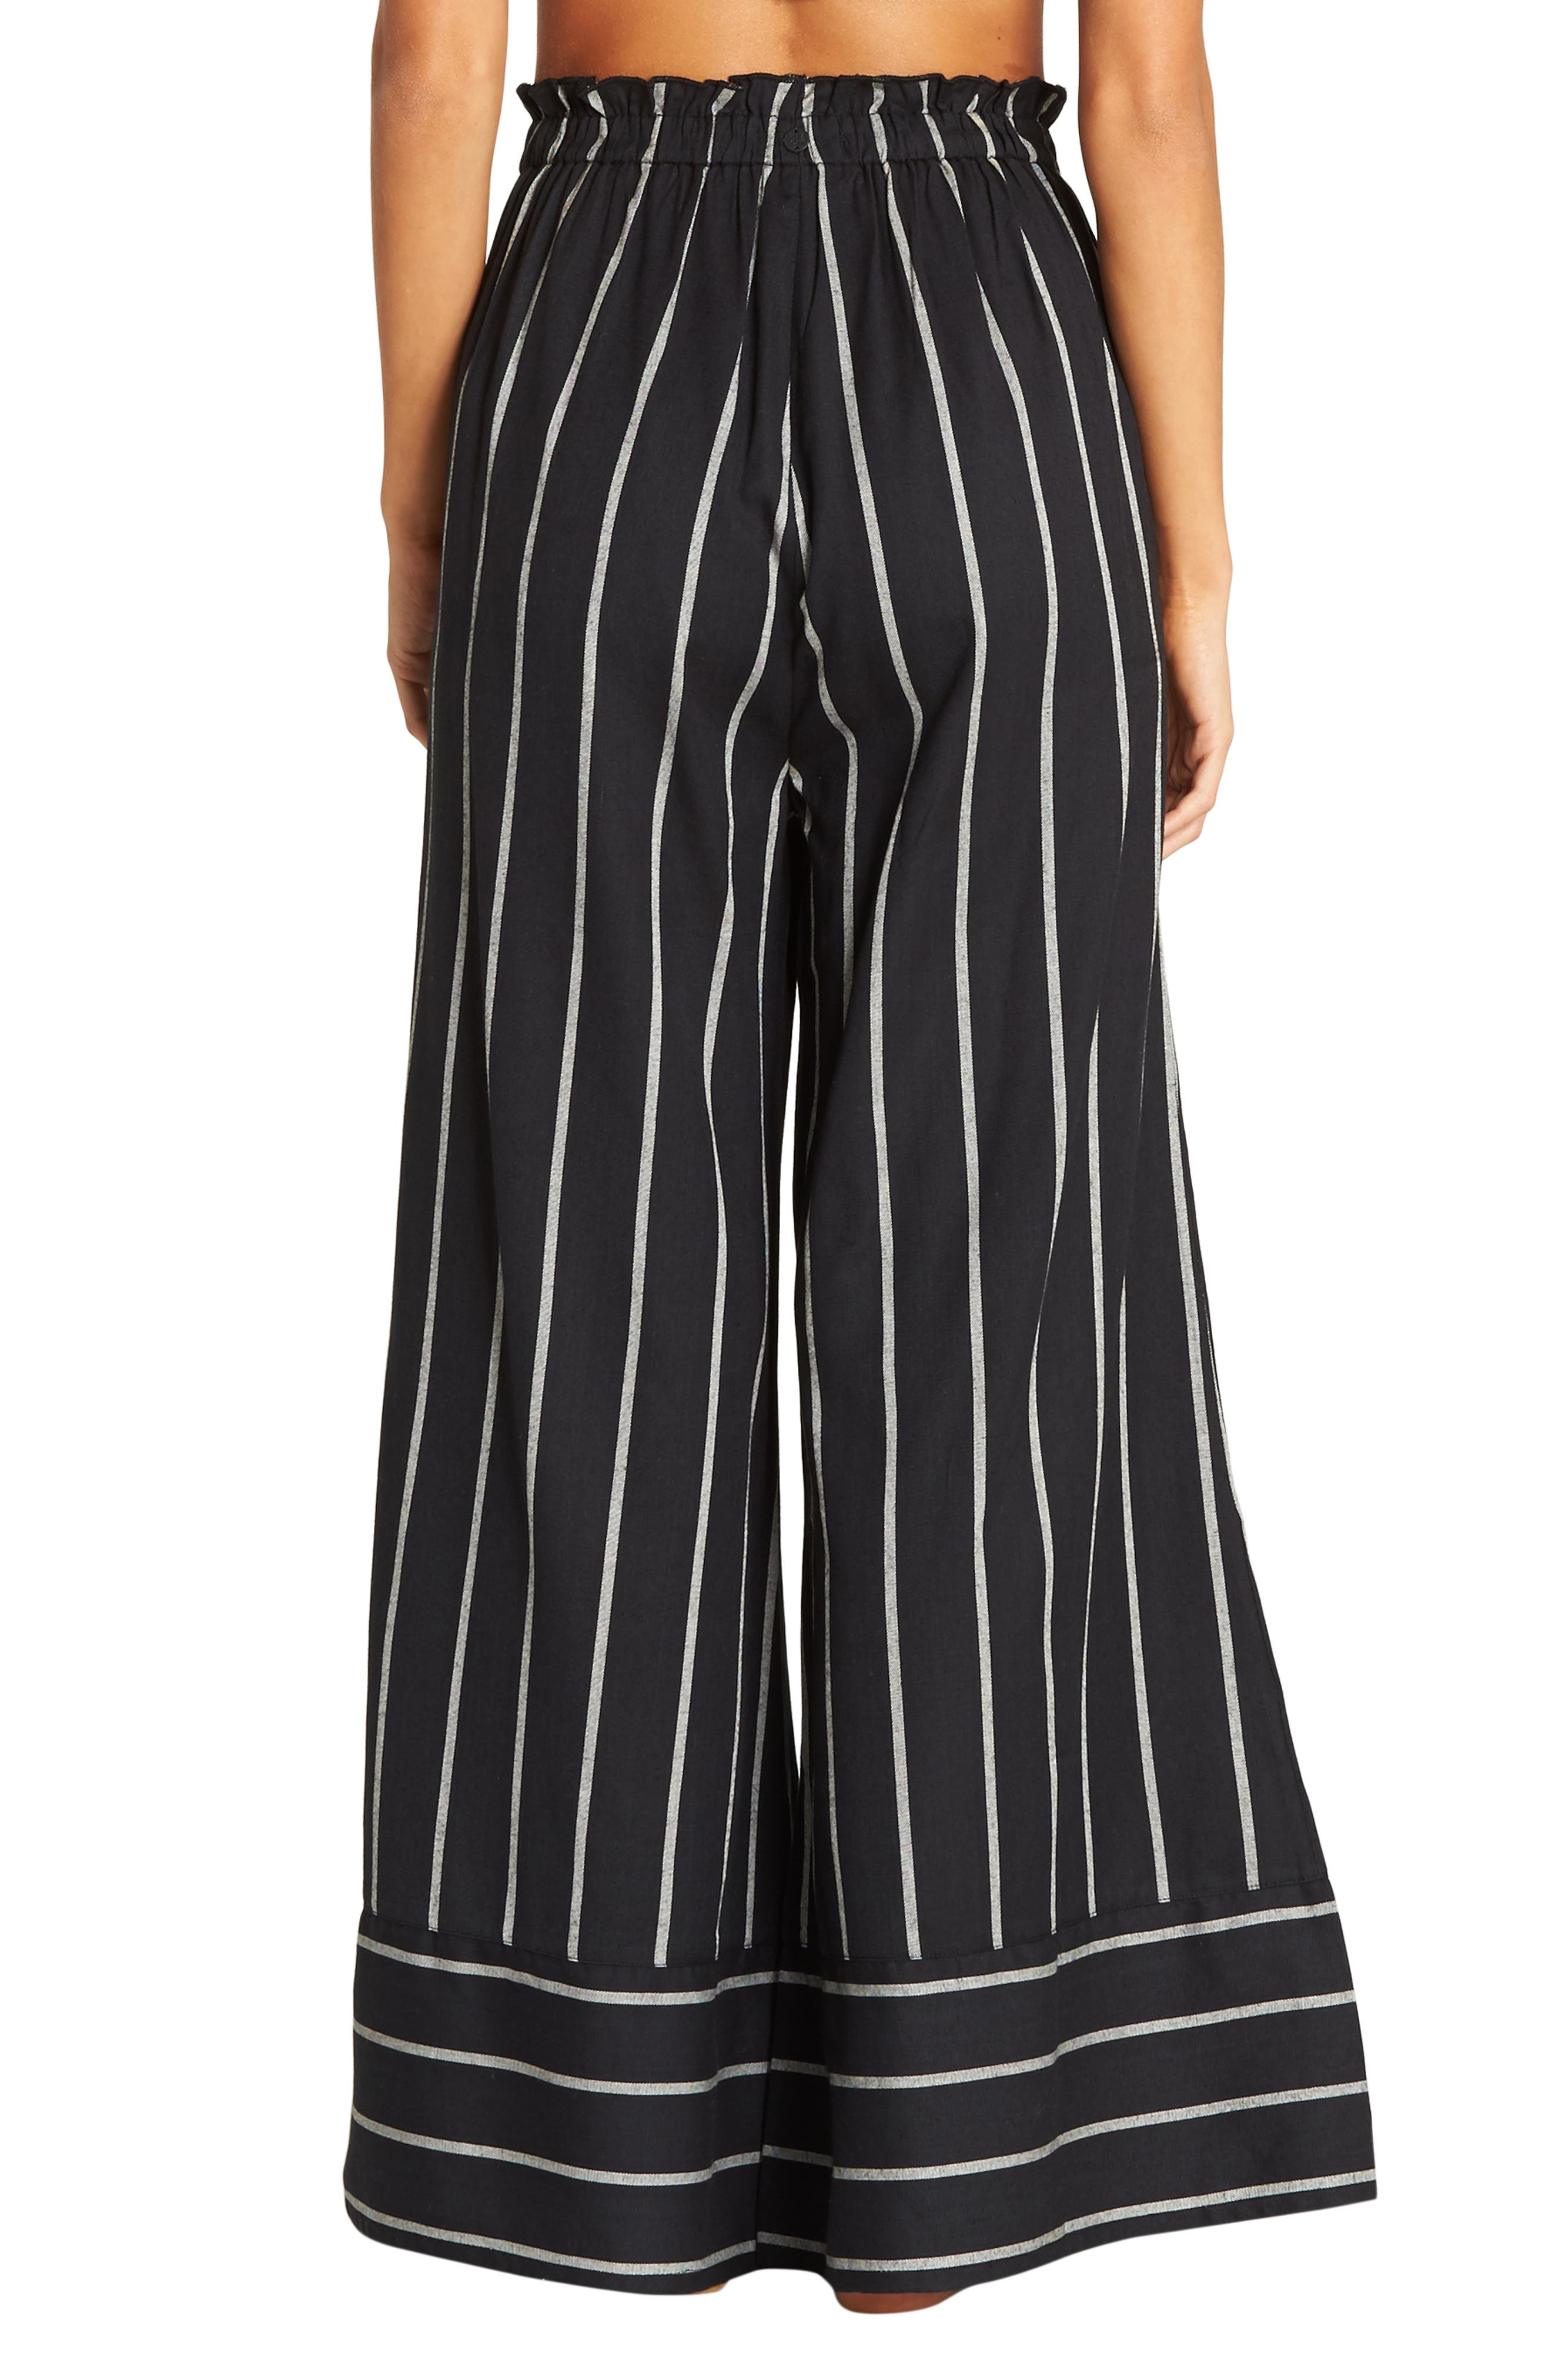 BILLABONG, Flip Out Stripe Wide Leg Pants, Alternate thumbnail 2, color, BLACK